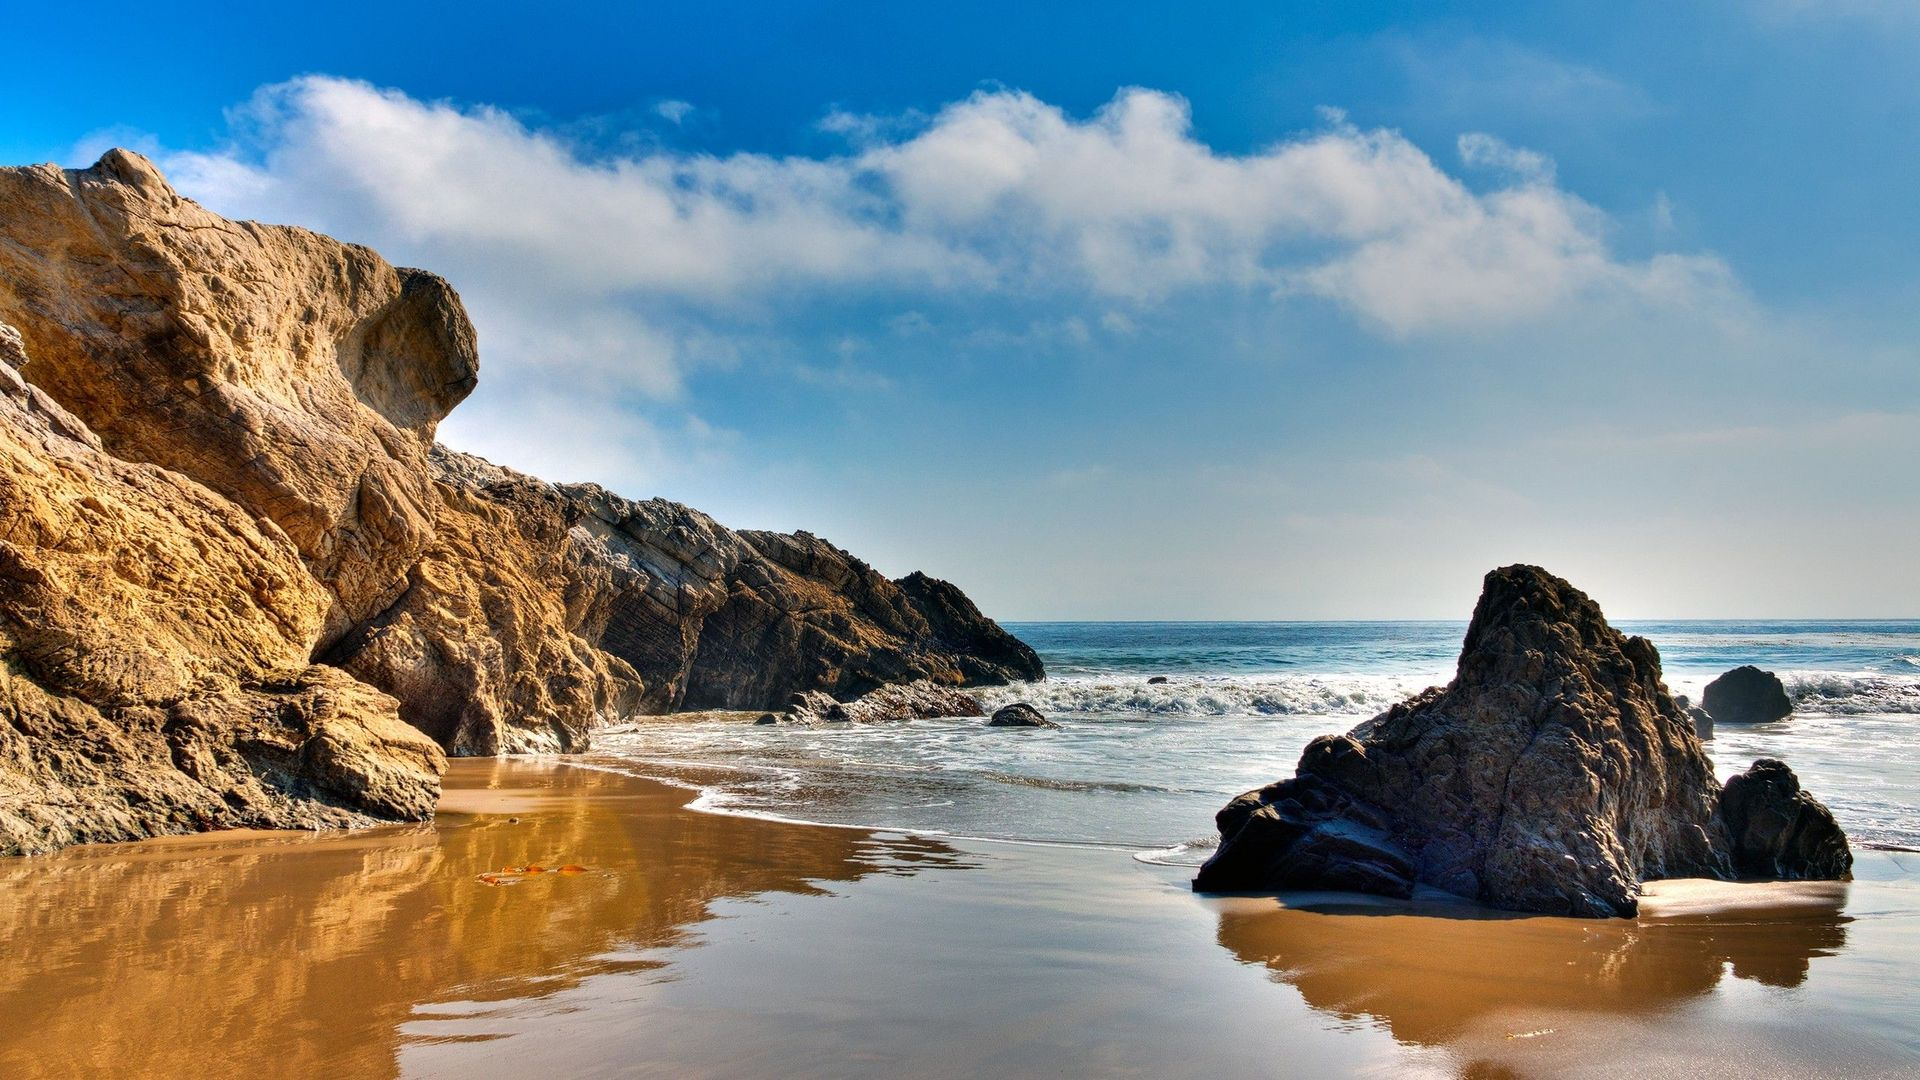 Beach Rocks Wallpaper 1920x1080 59902